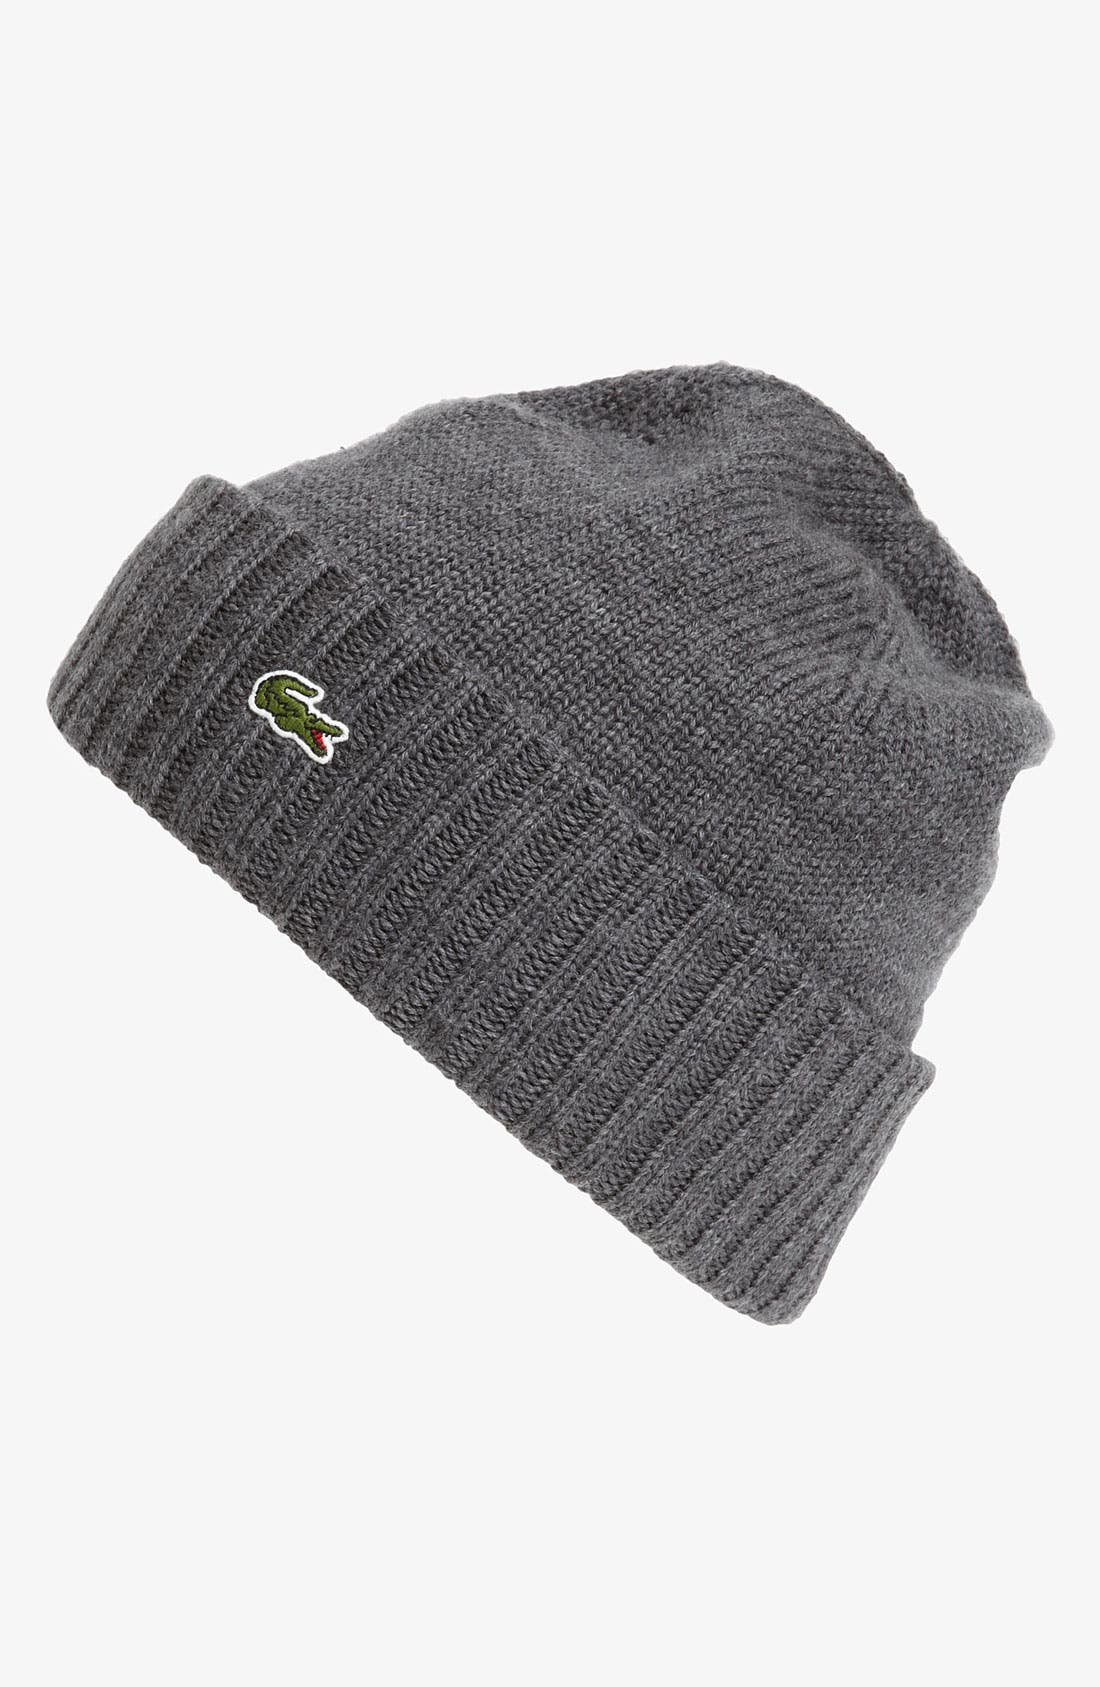 Main Image - Lacoste Wool Knit Cap